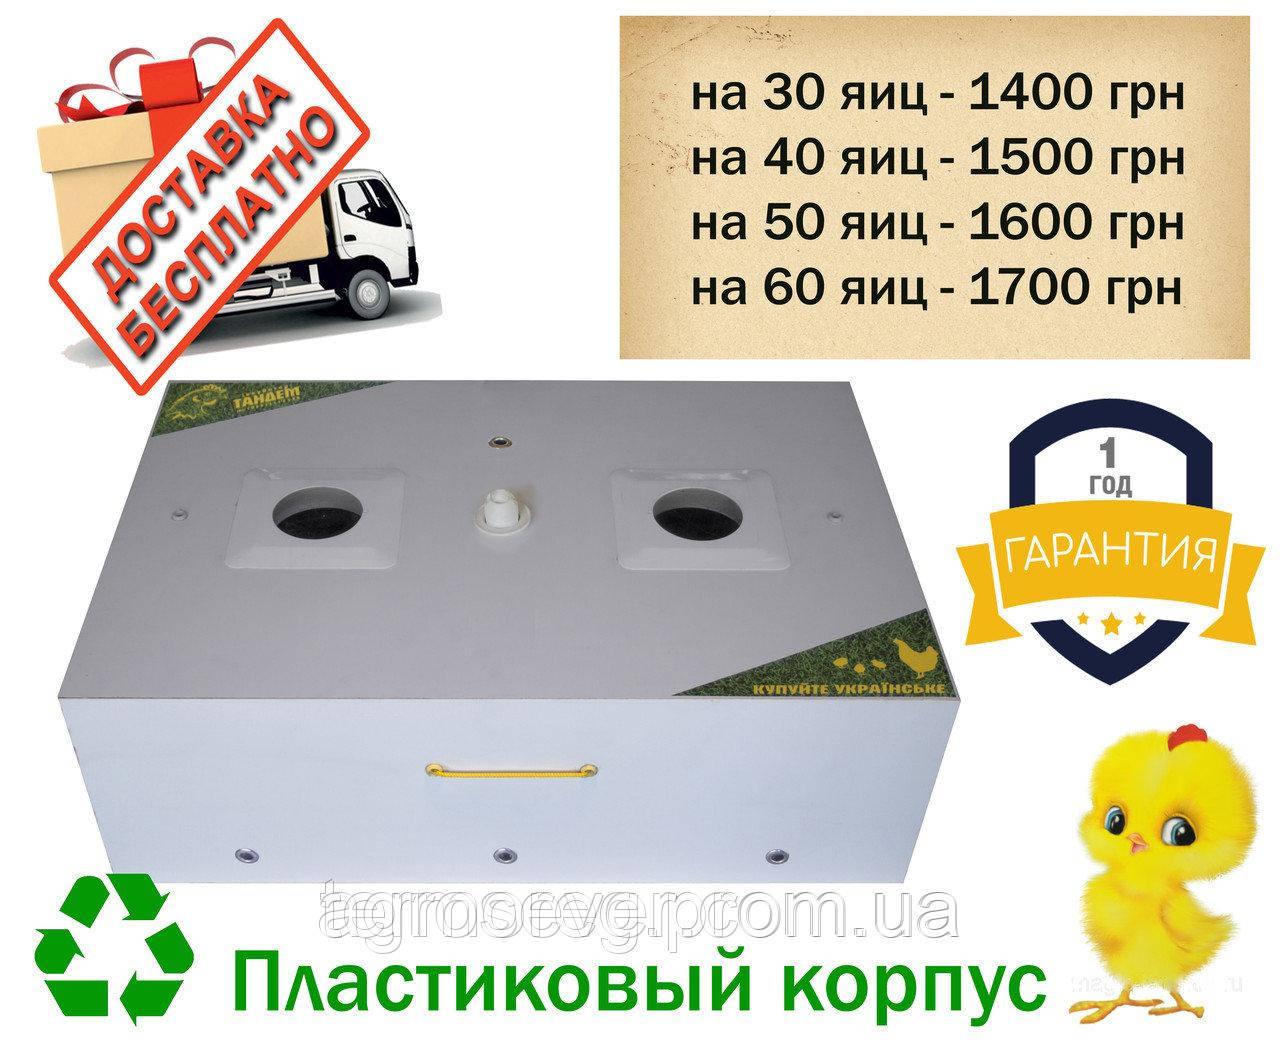 Инкубатор мини 40 Тандем (термокабель) на 40 куриных яиц